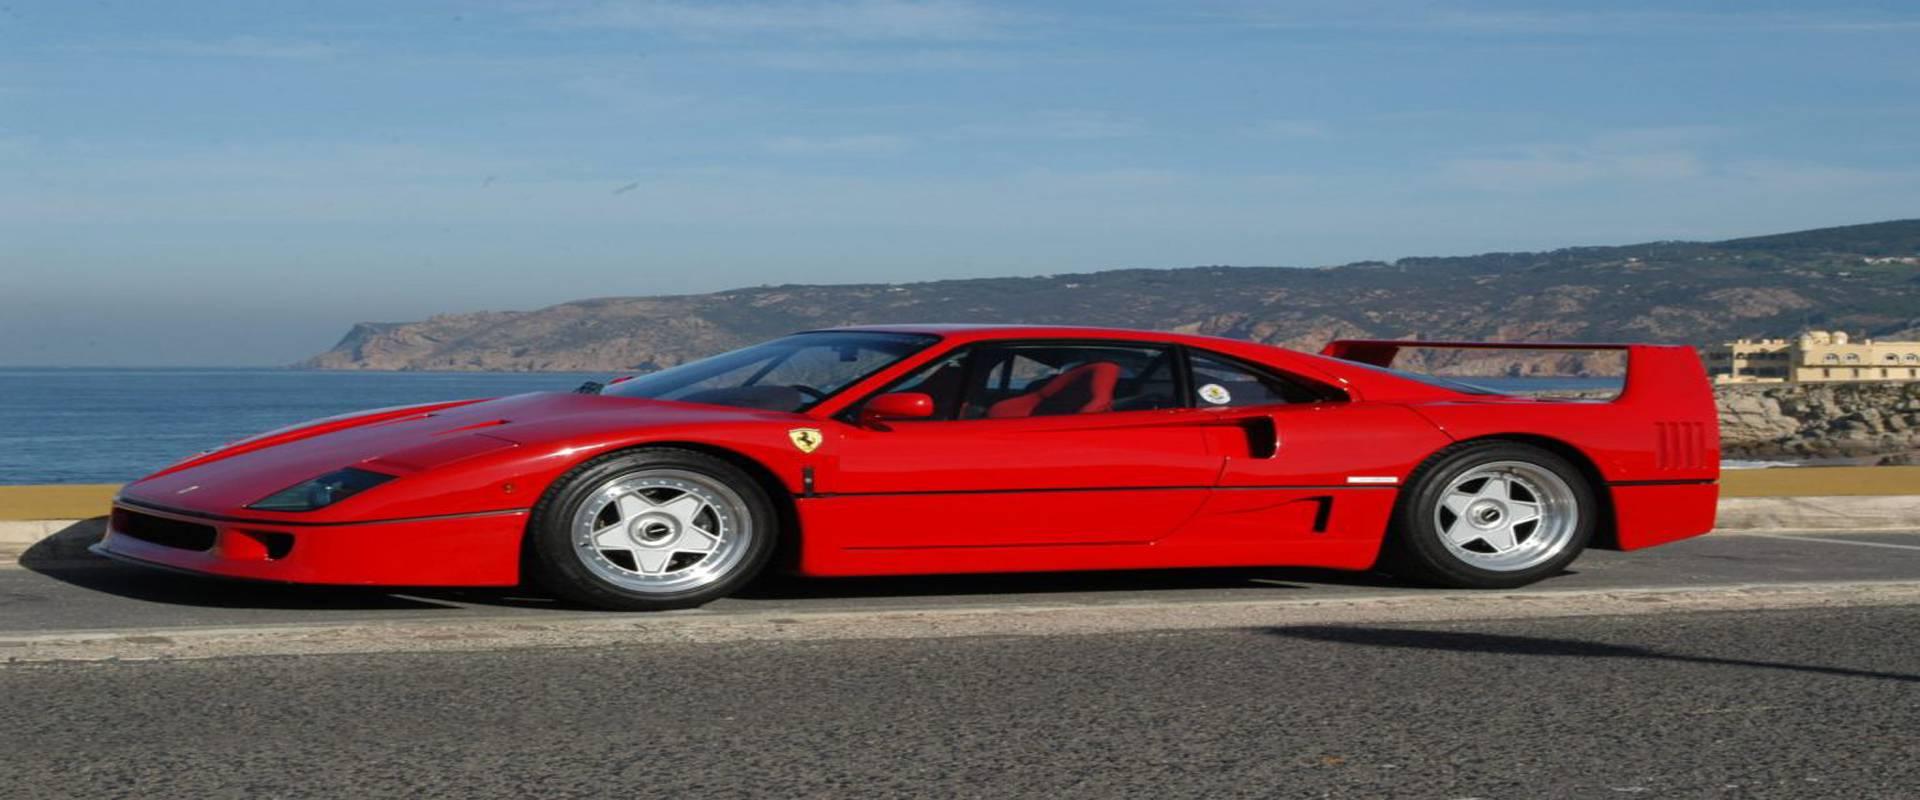 Ferrari F40 – The Long Wait & Finally Coming to America Ferrari